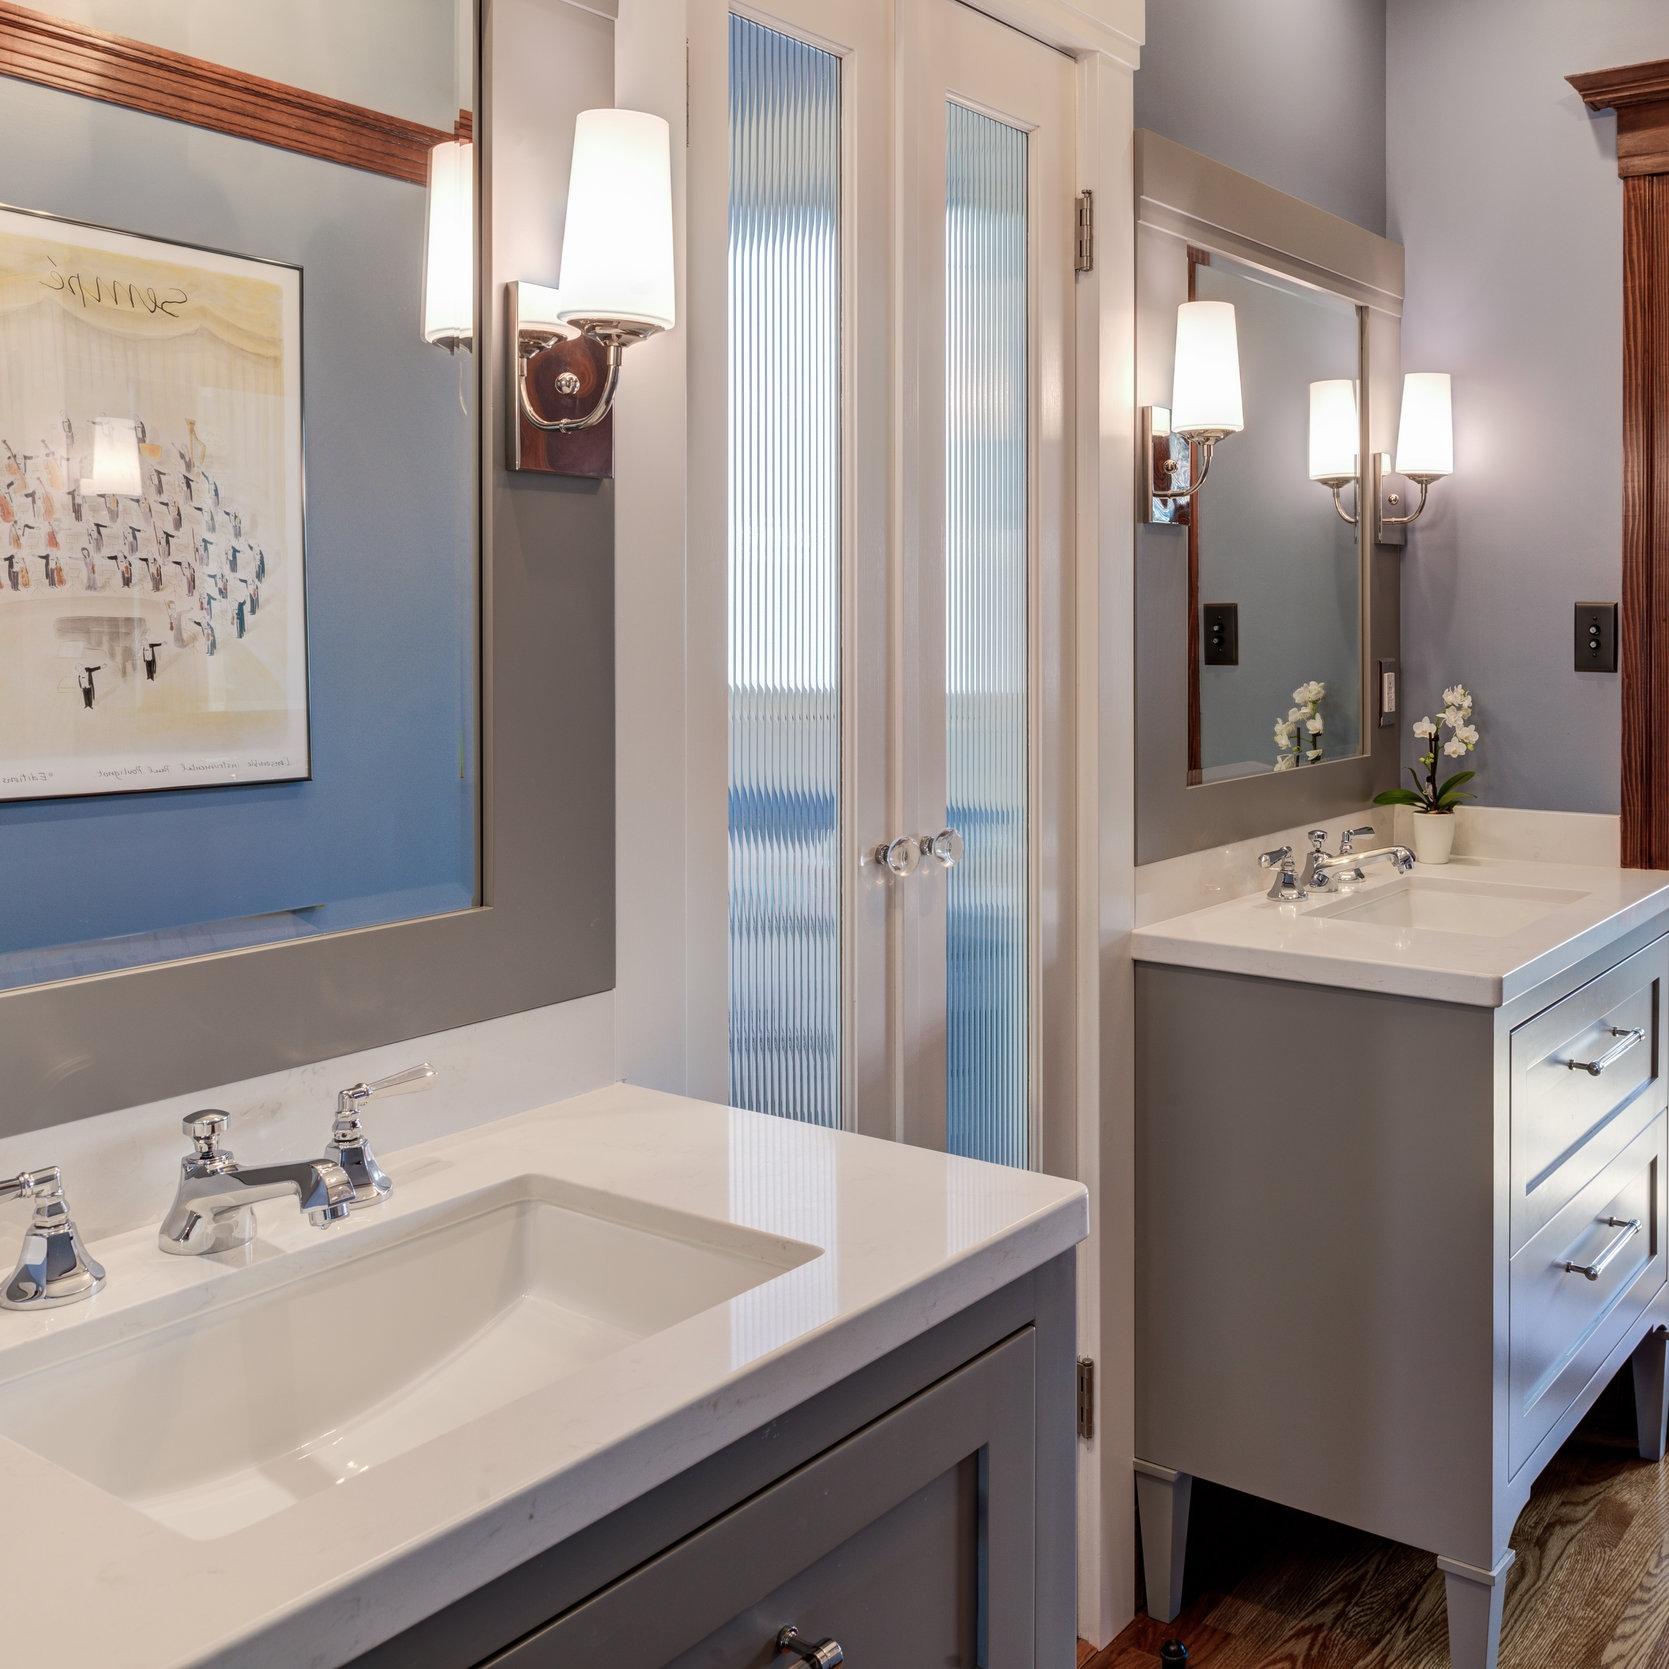 South Berkeley Traditional Family Bath  2018 Bay Area Remodeling Award Winner